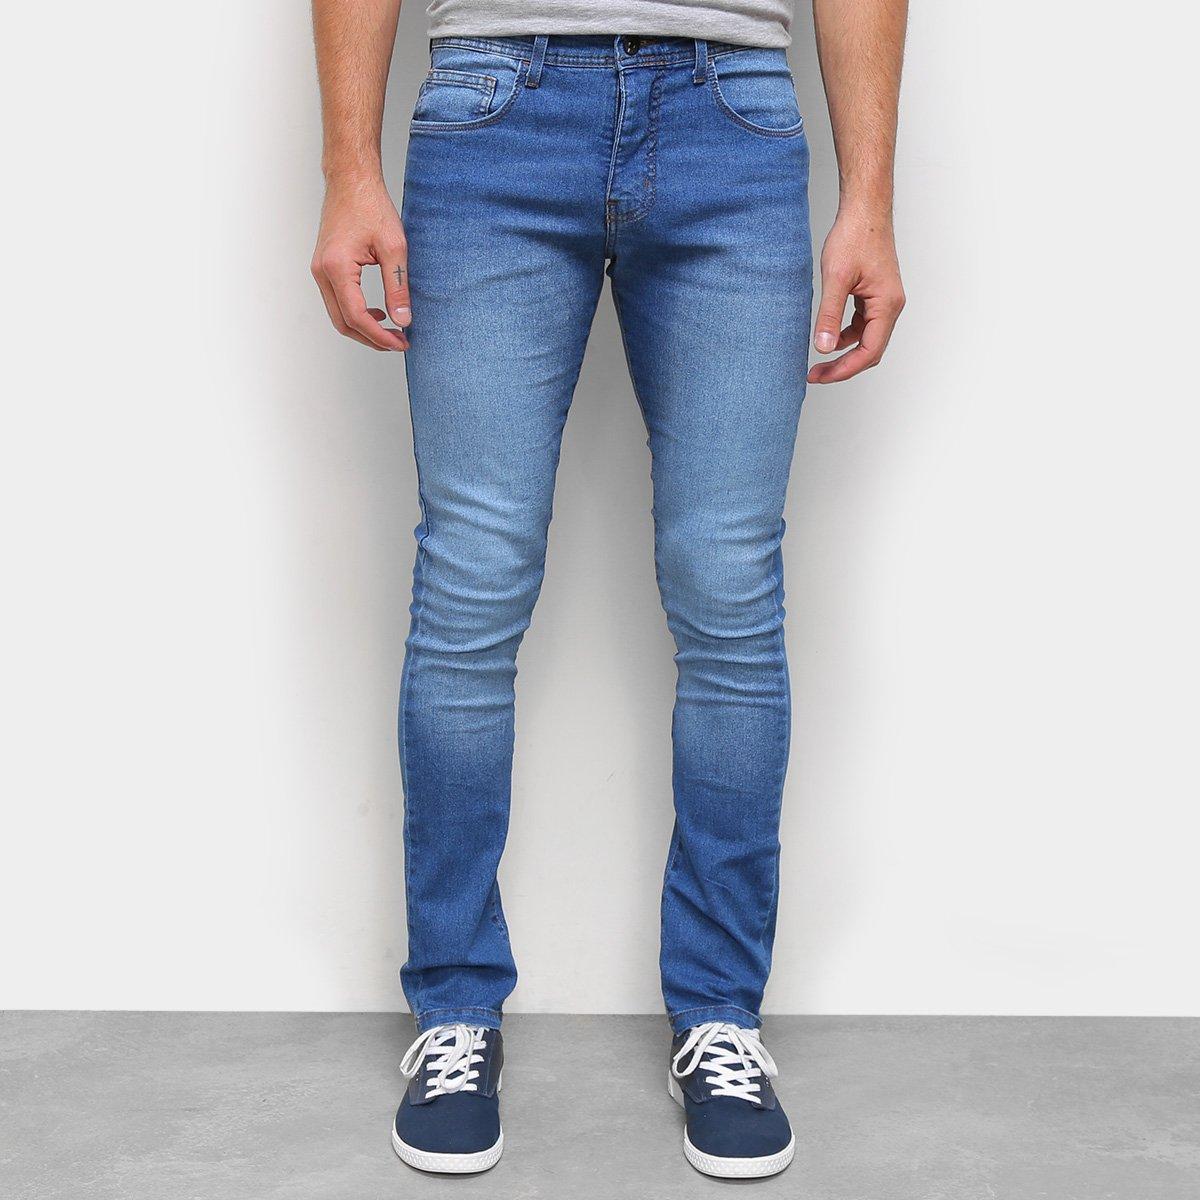 Calça Jeans Quiksilver Estonada Masculina